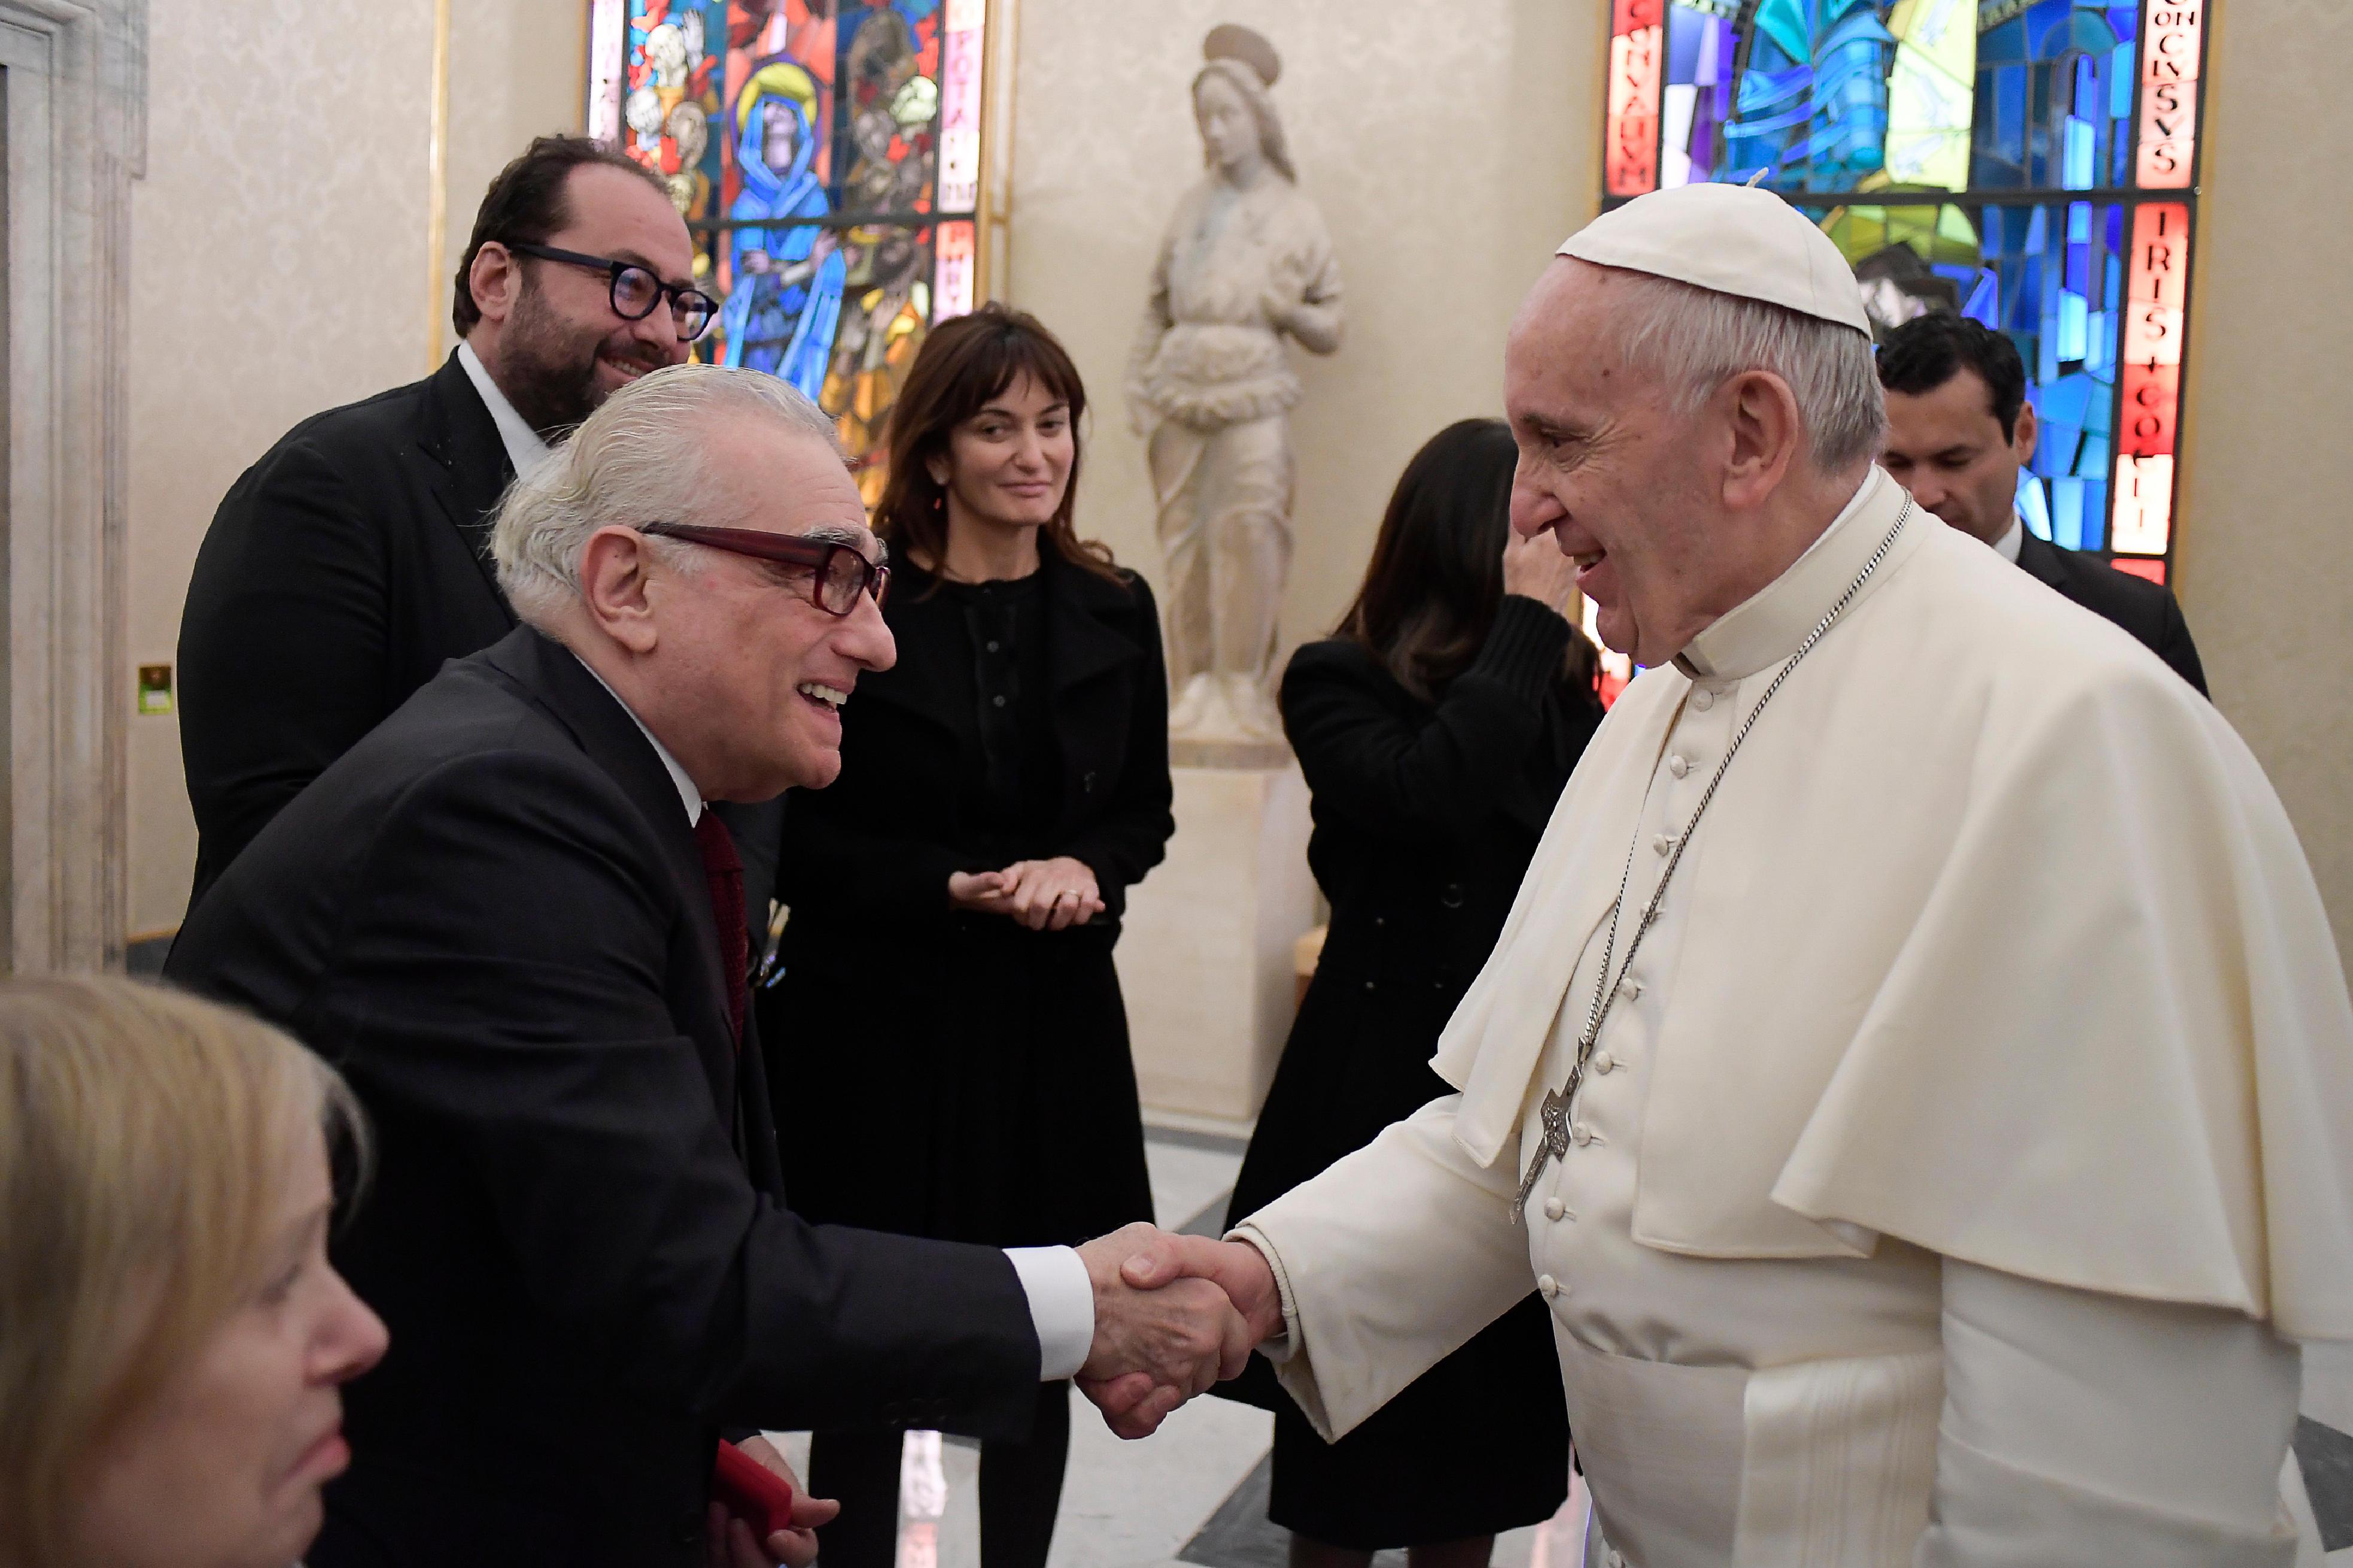 مارتن سكورسيزى والبابا